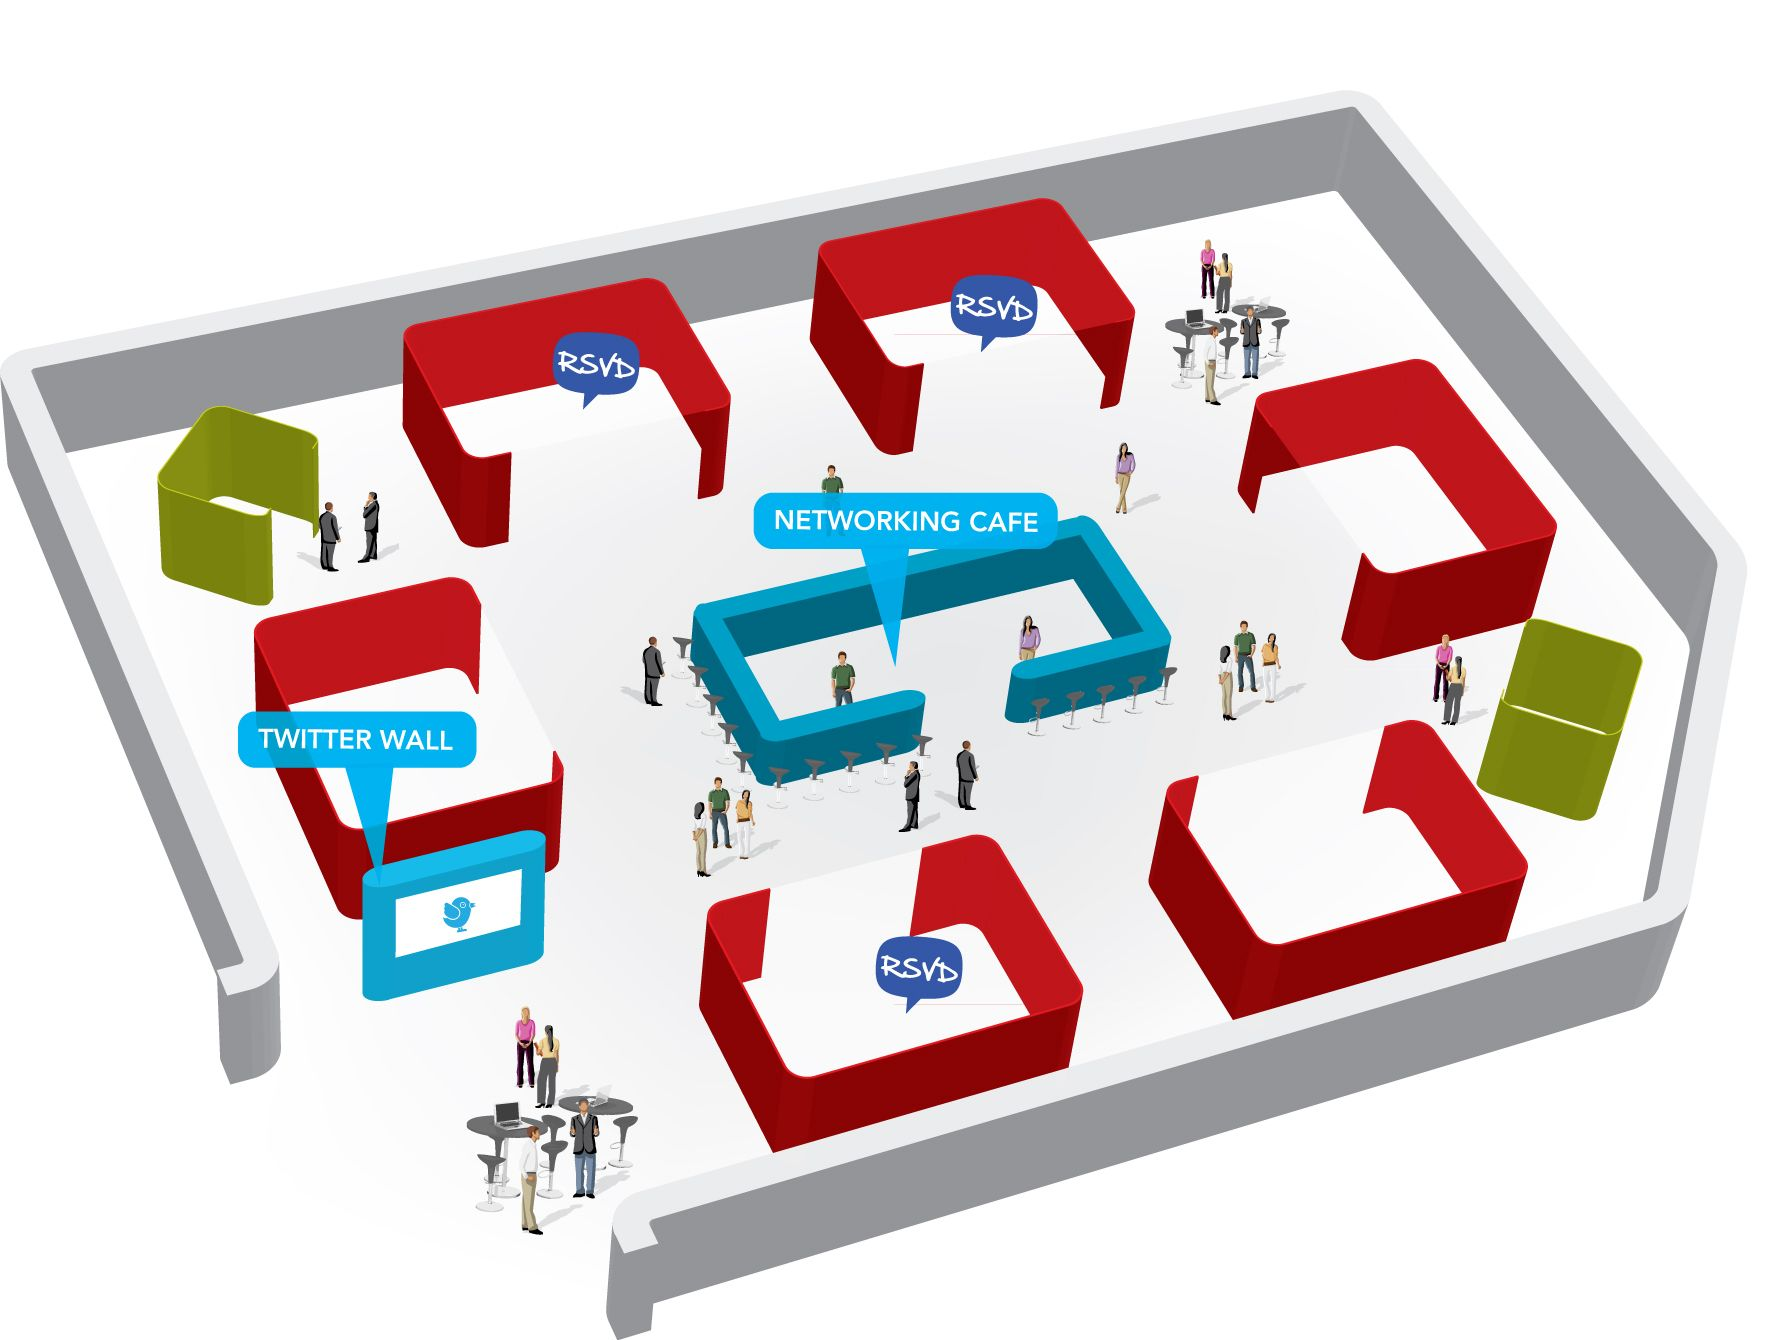 Exhibition Booth Floor Plan : Exhibition floor plan 展览 pinterest